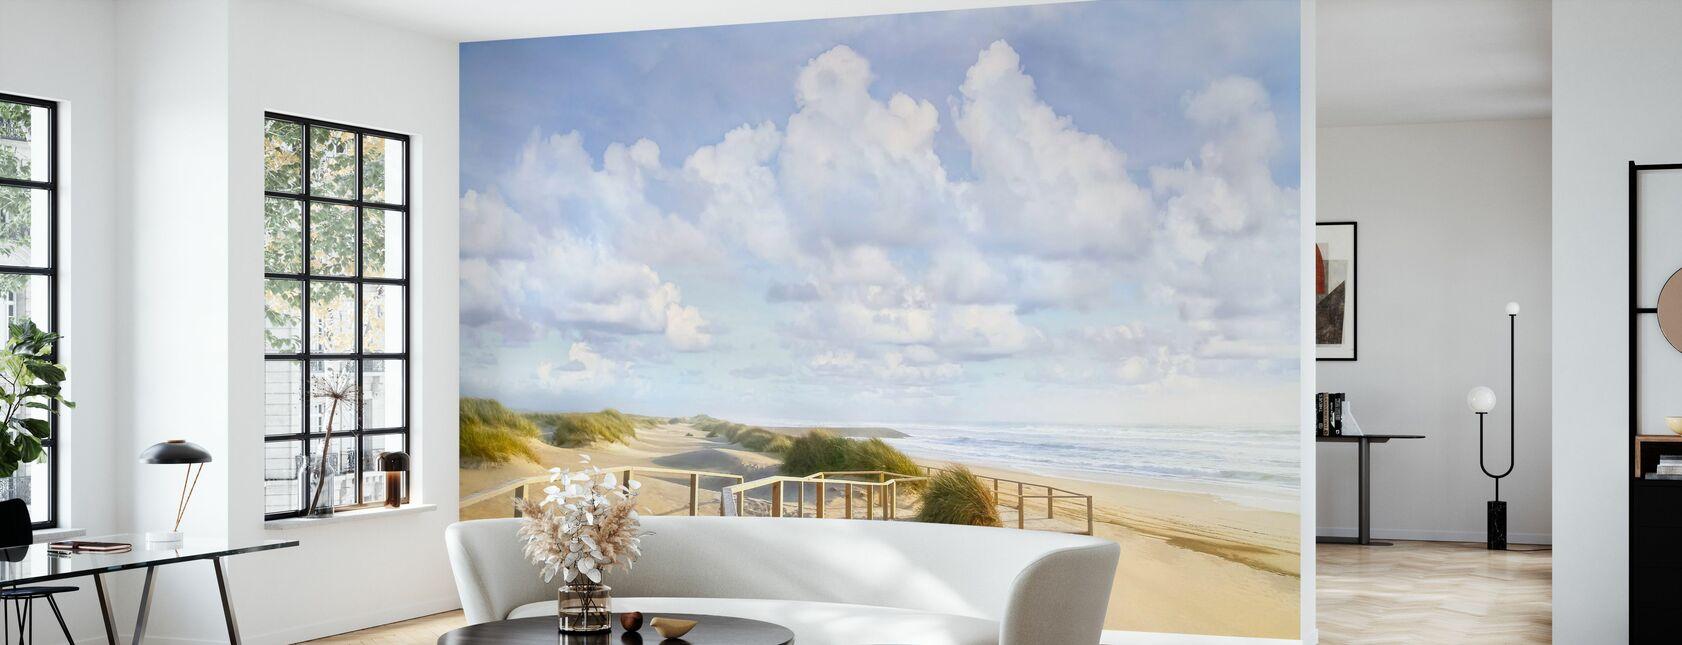 Beach Boardwalk - Wallpaper - Living Room